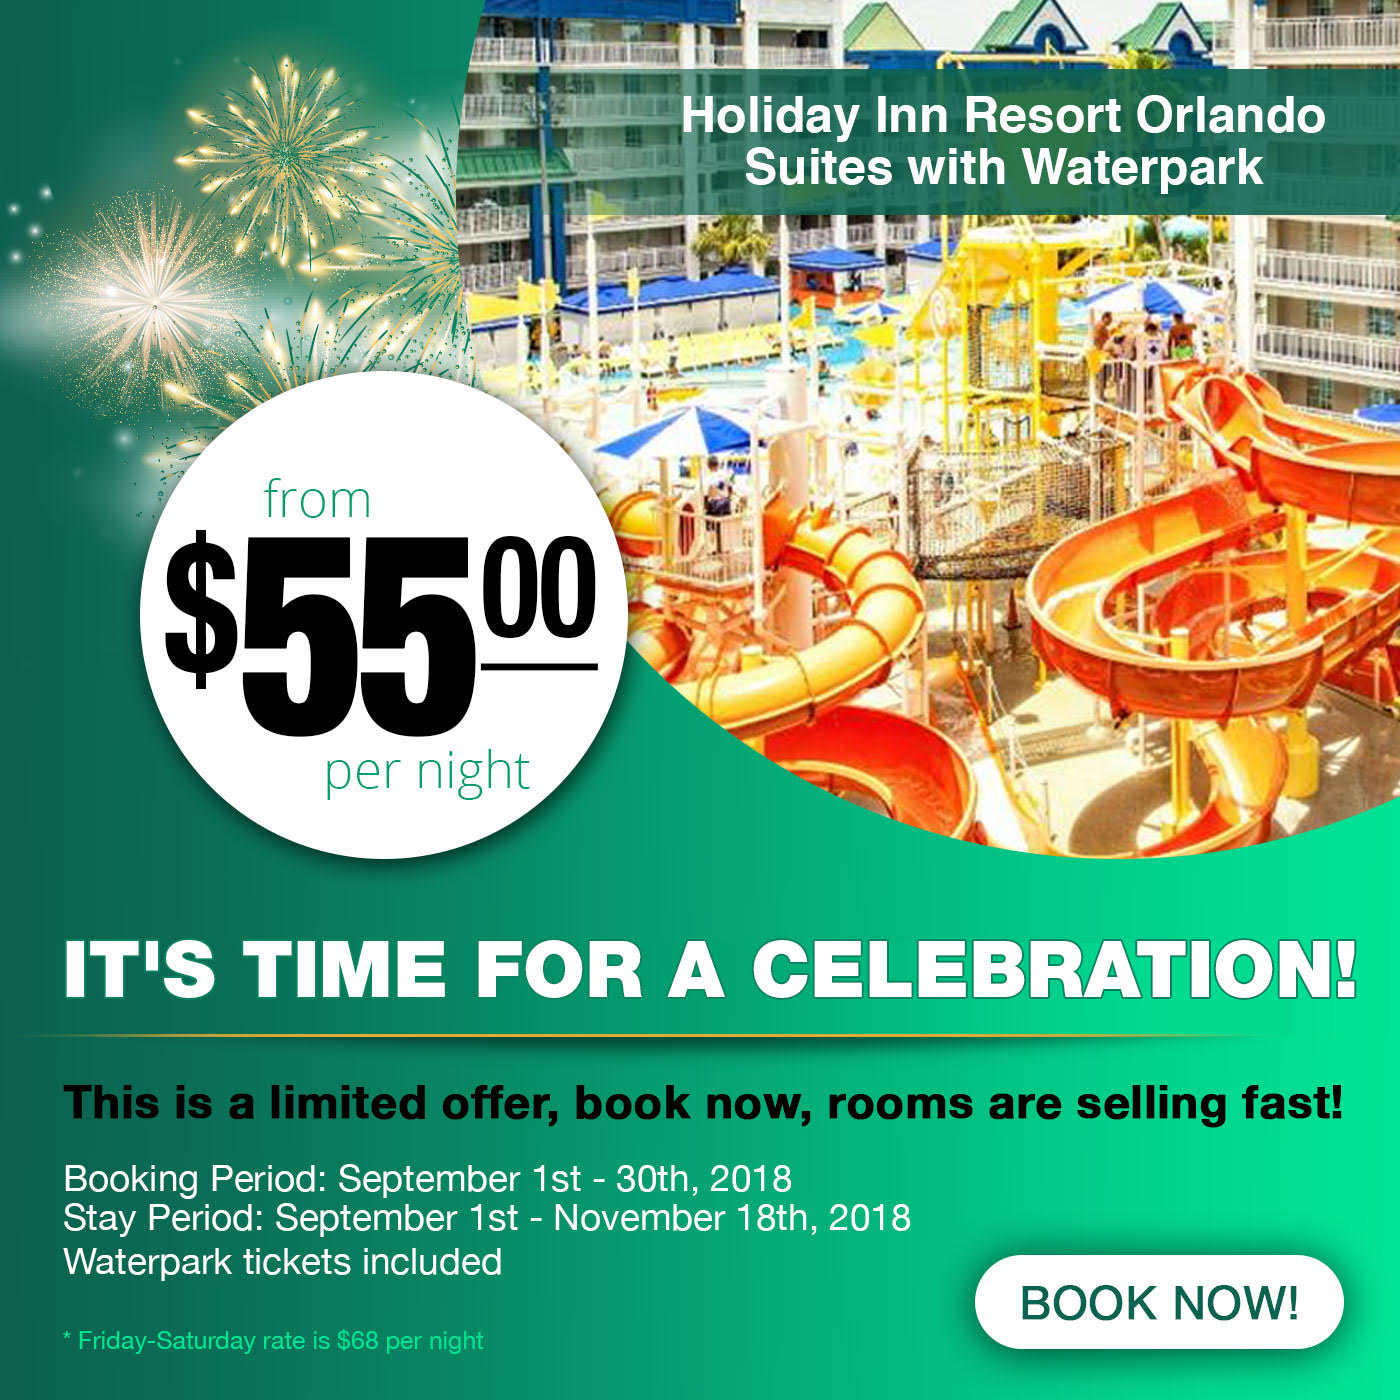 Cheap Universal Studios Orlando Vacation Packages: Orlando Employee Discounts